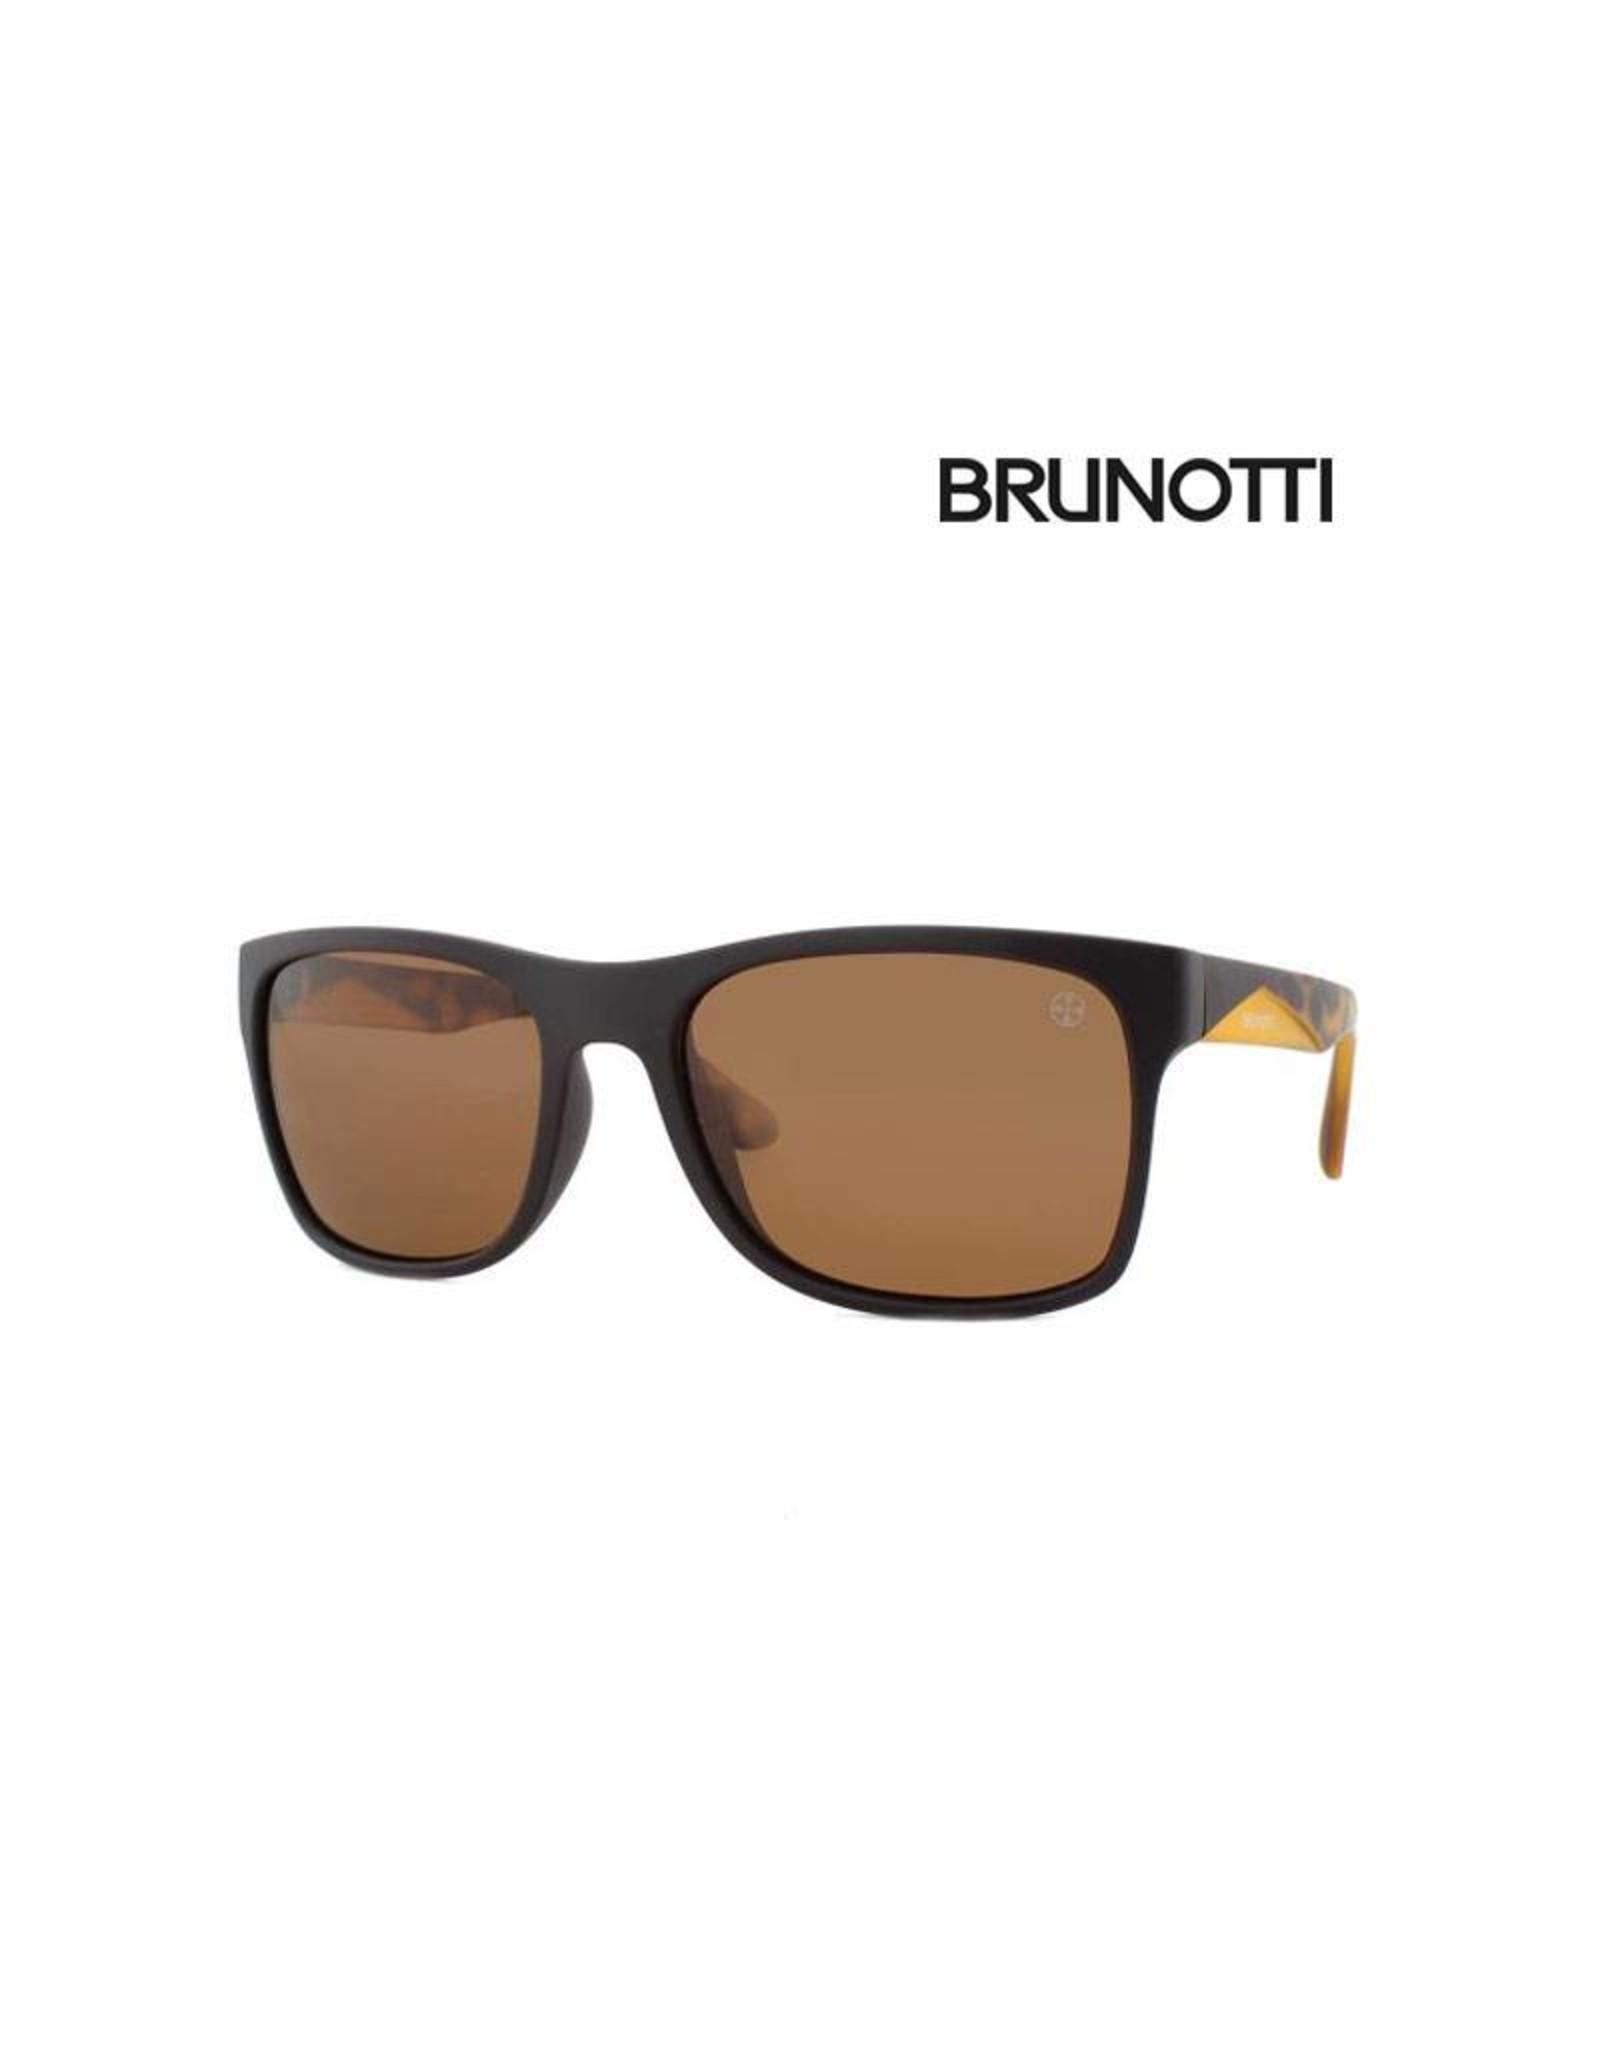 BRUNOTTI BRUNOTTI HABLIO 2 Brown Zonnebril Uni